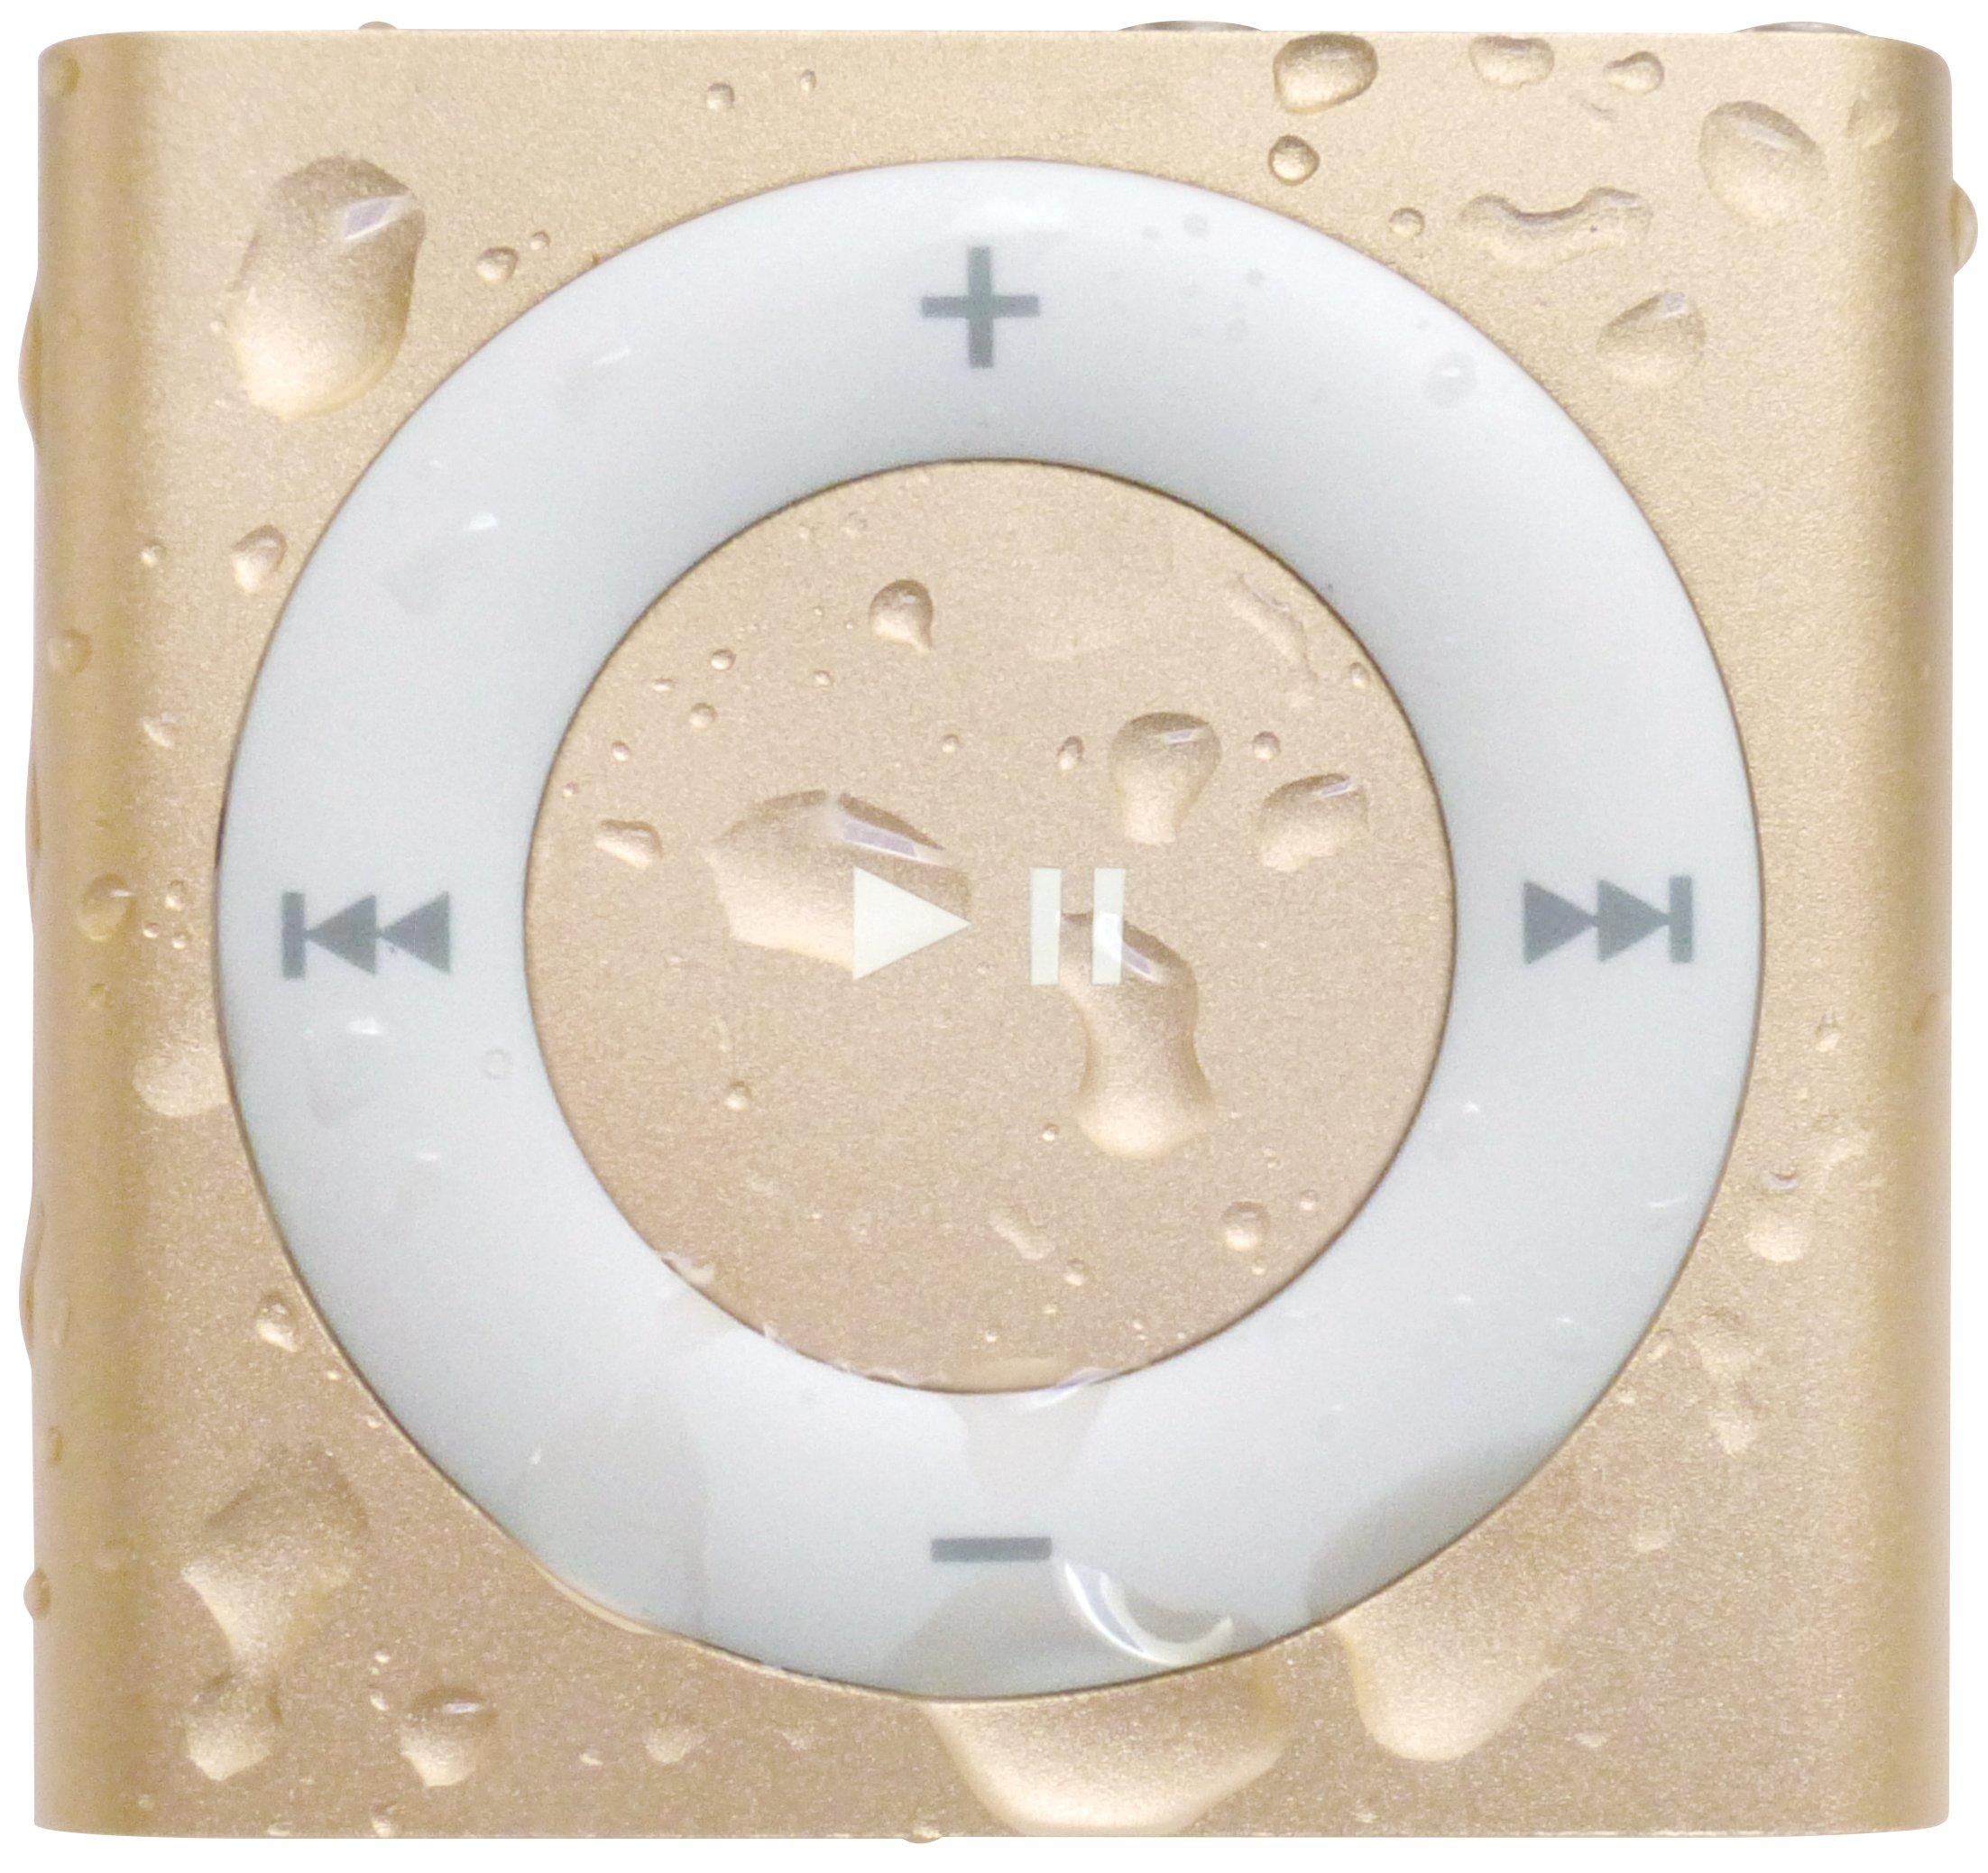 Underwater Audio 100% Waterproofing Compatible with iPod Shuffle, Swimbuds Sport Headphones, AquaGuard, and iFloatie (Gold) by Underwater Audio (Image #3)